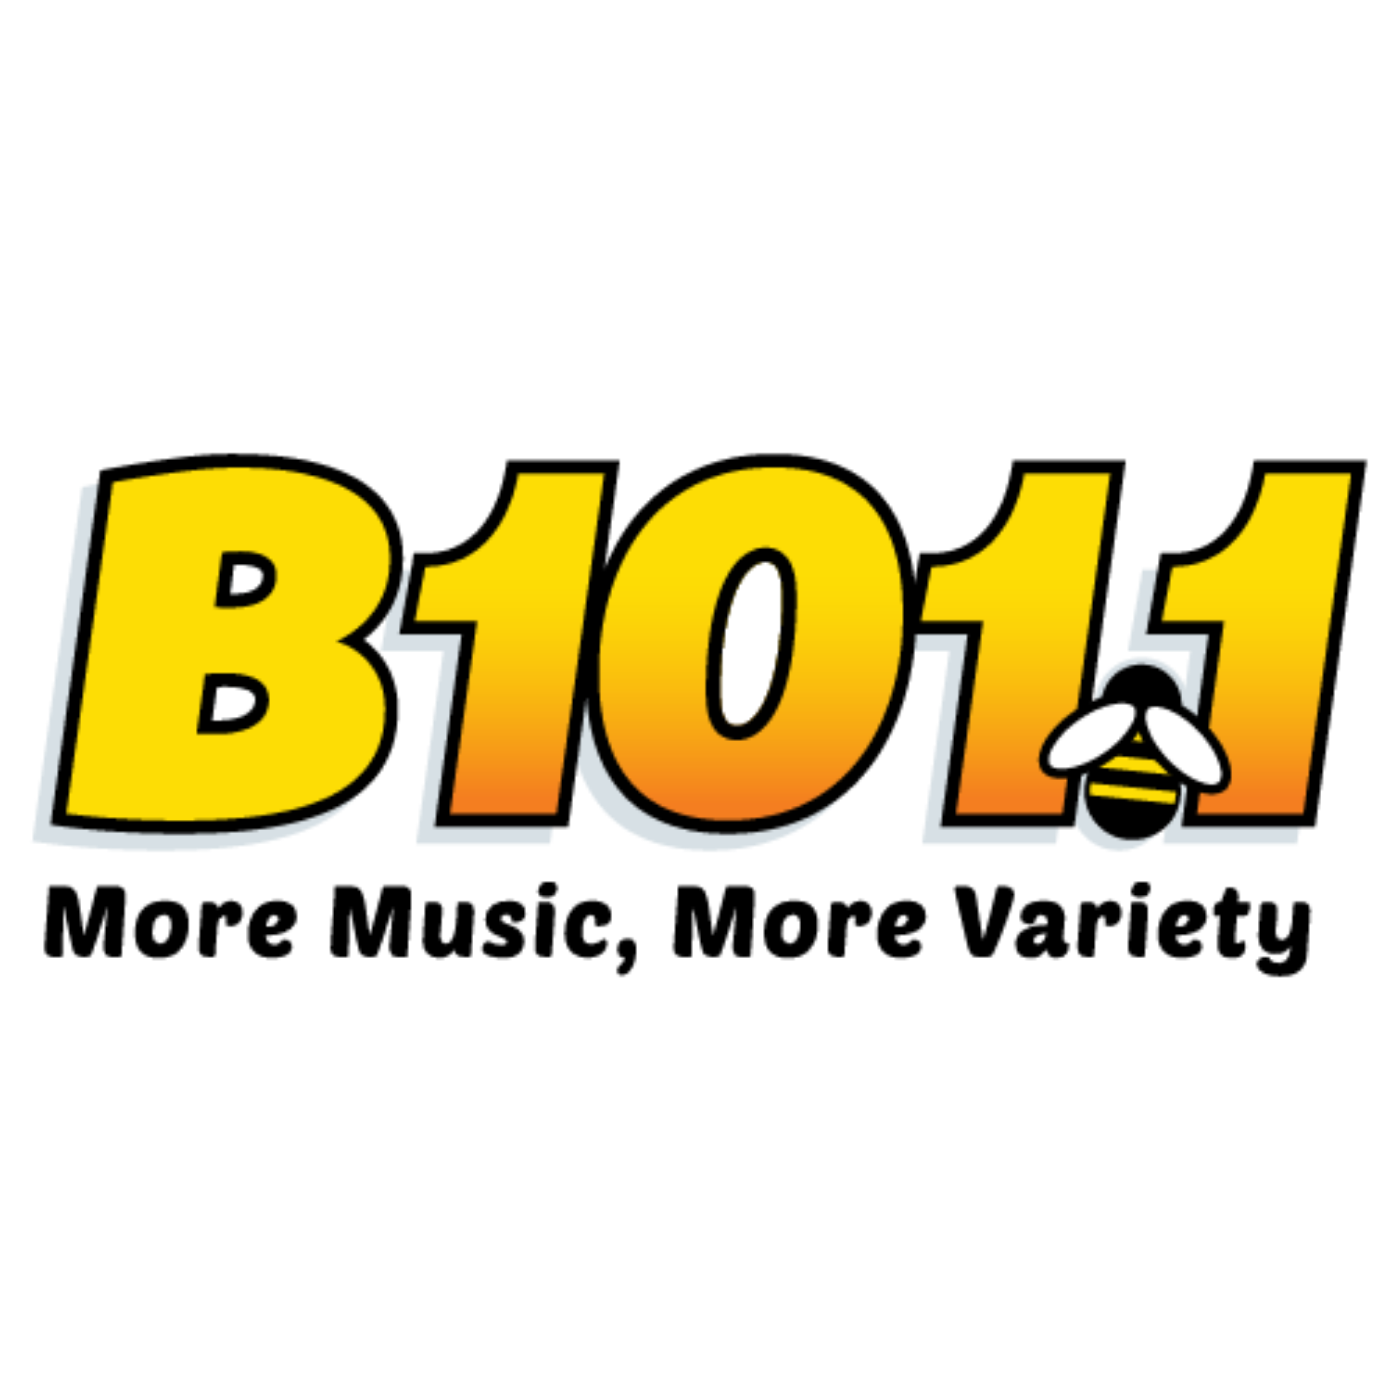 Philly's B101.1 - LISTEN LIVE | RADIO.COM